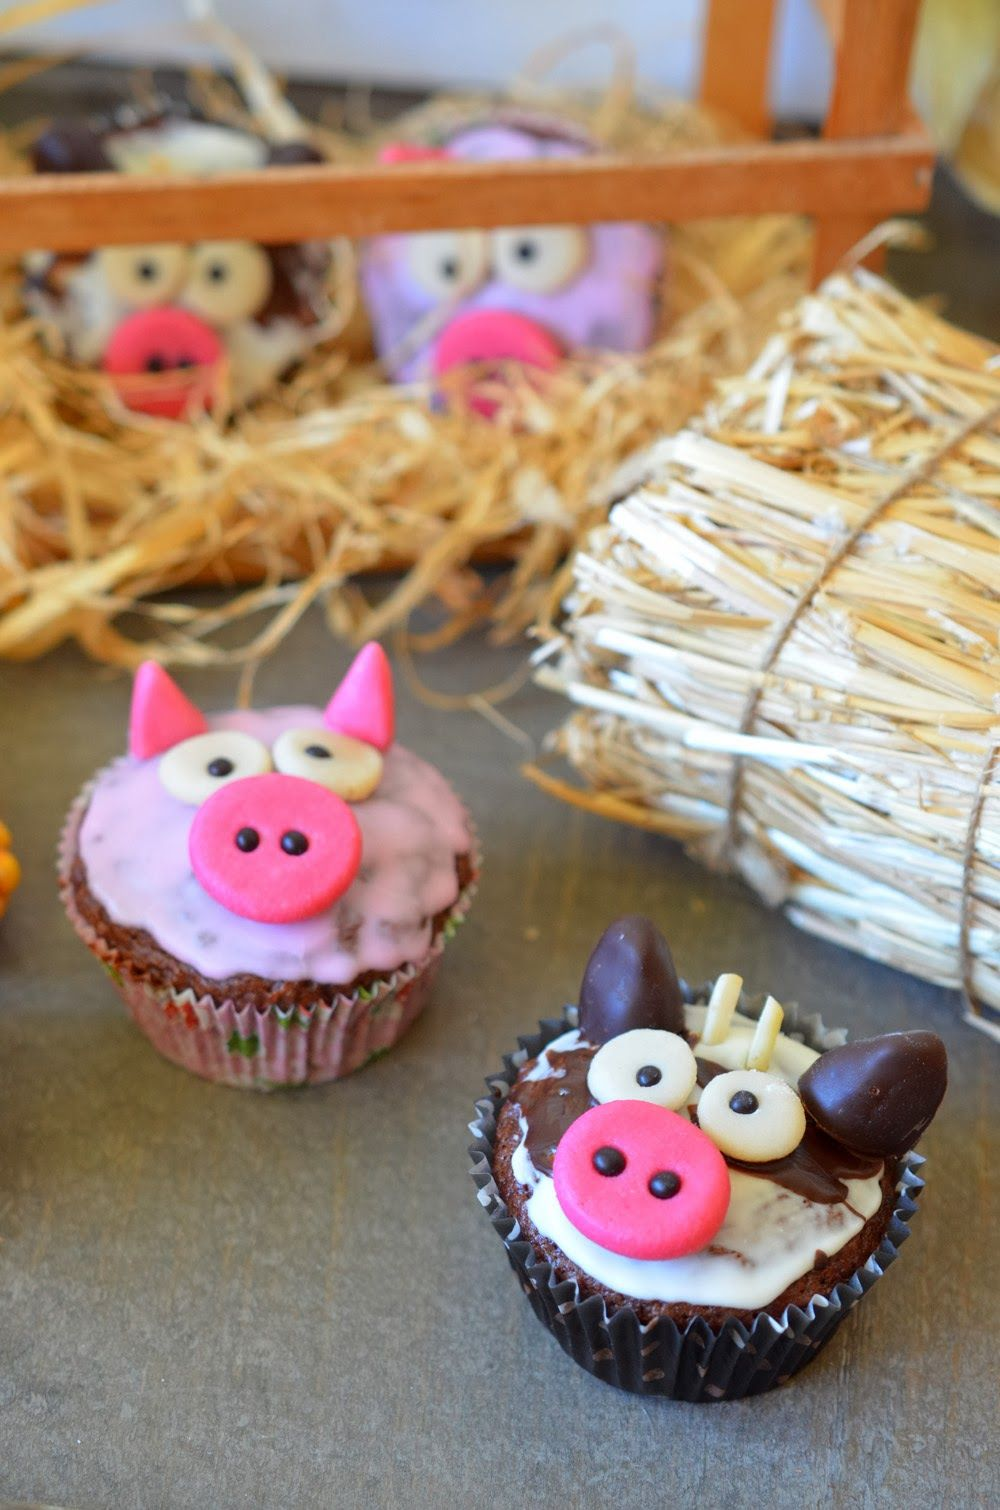 Ninas Kleiner Food Blog Bauernhof Geburtstag Play Time